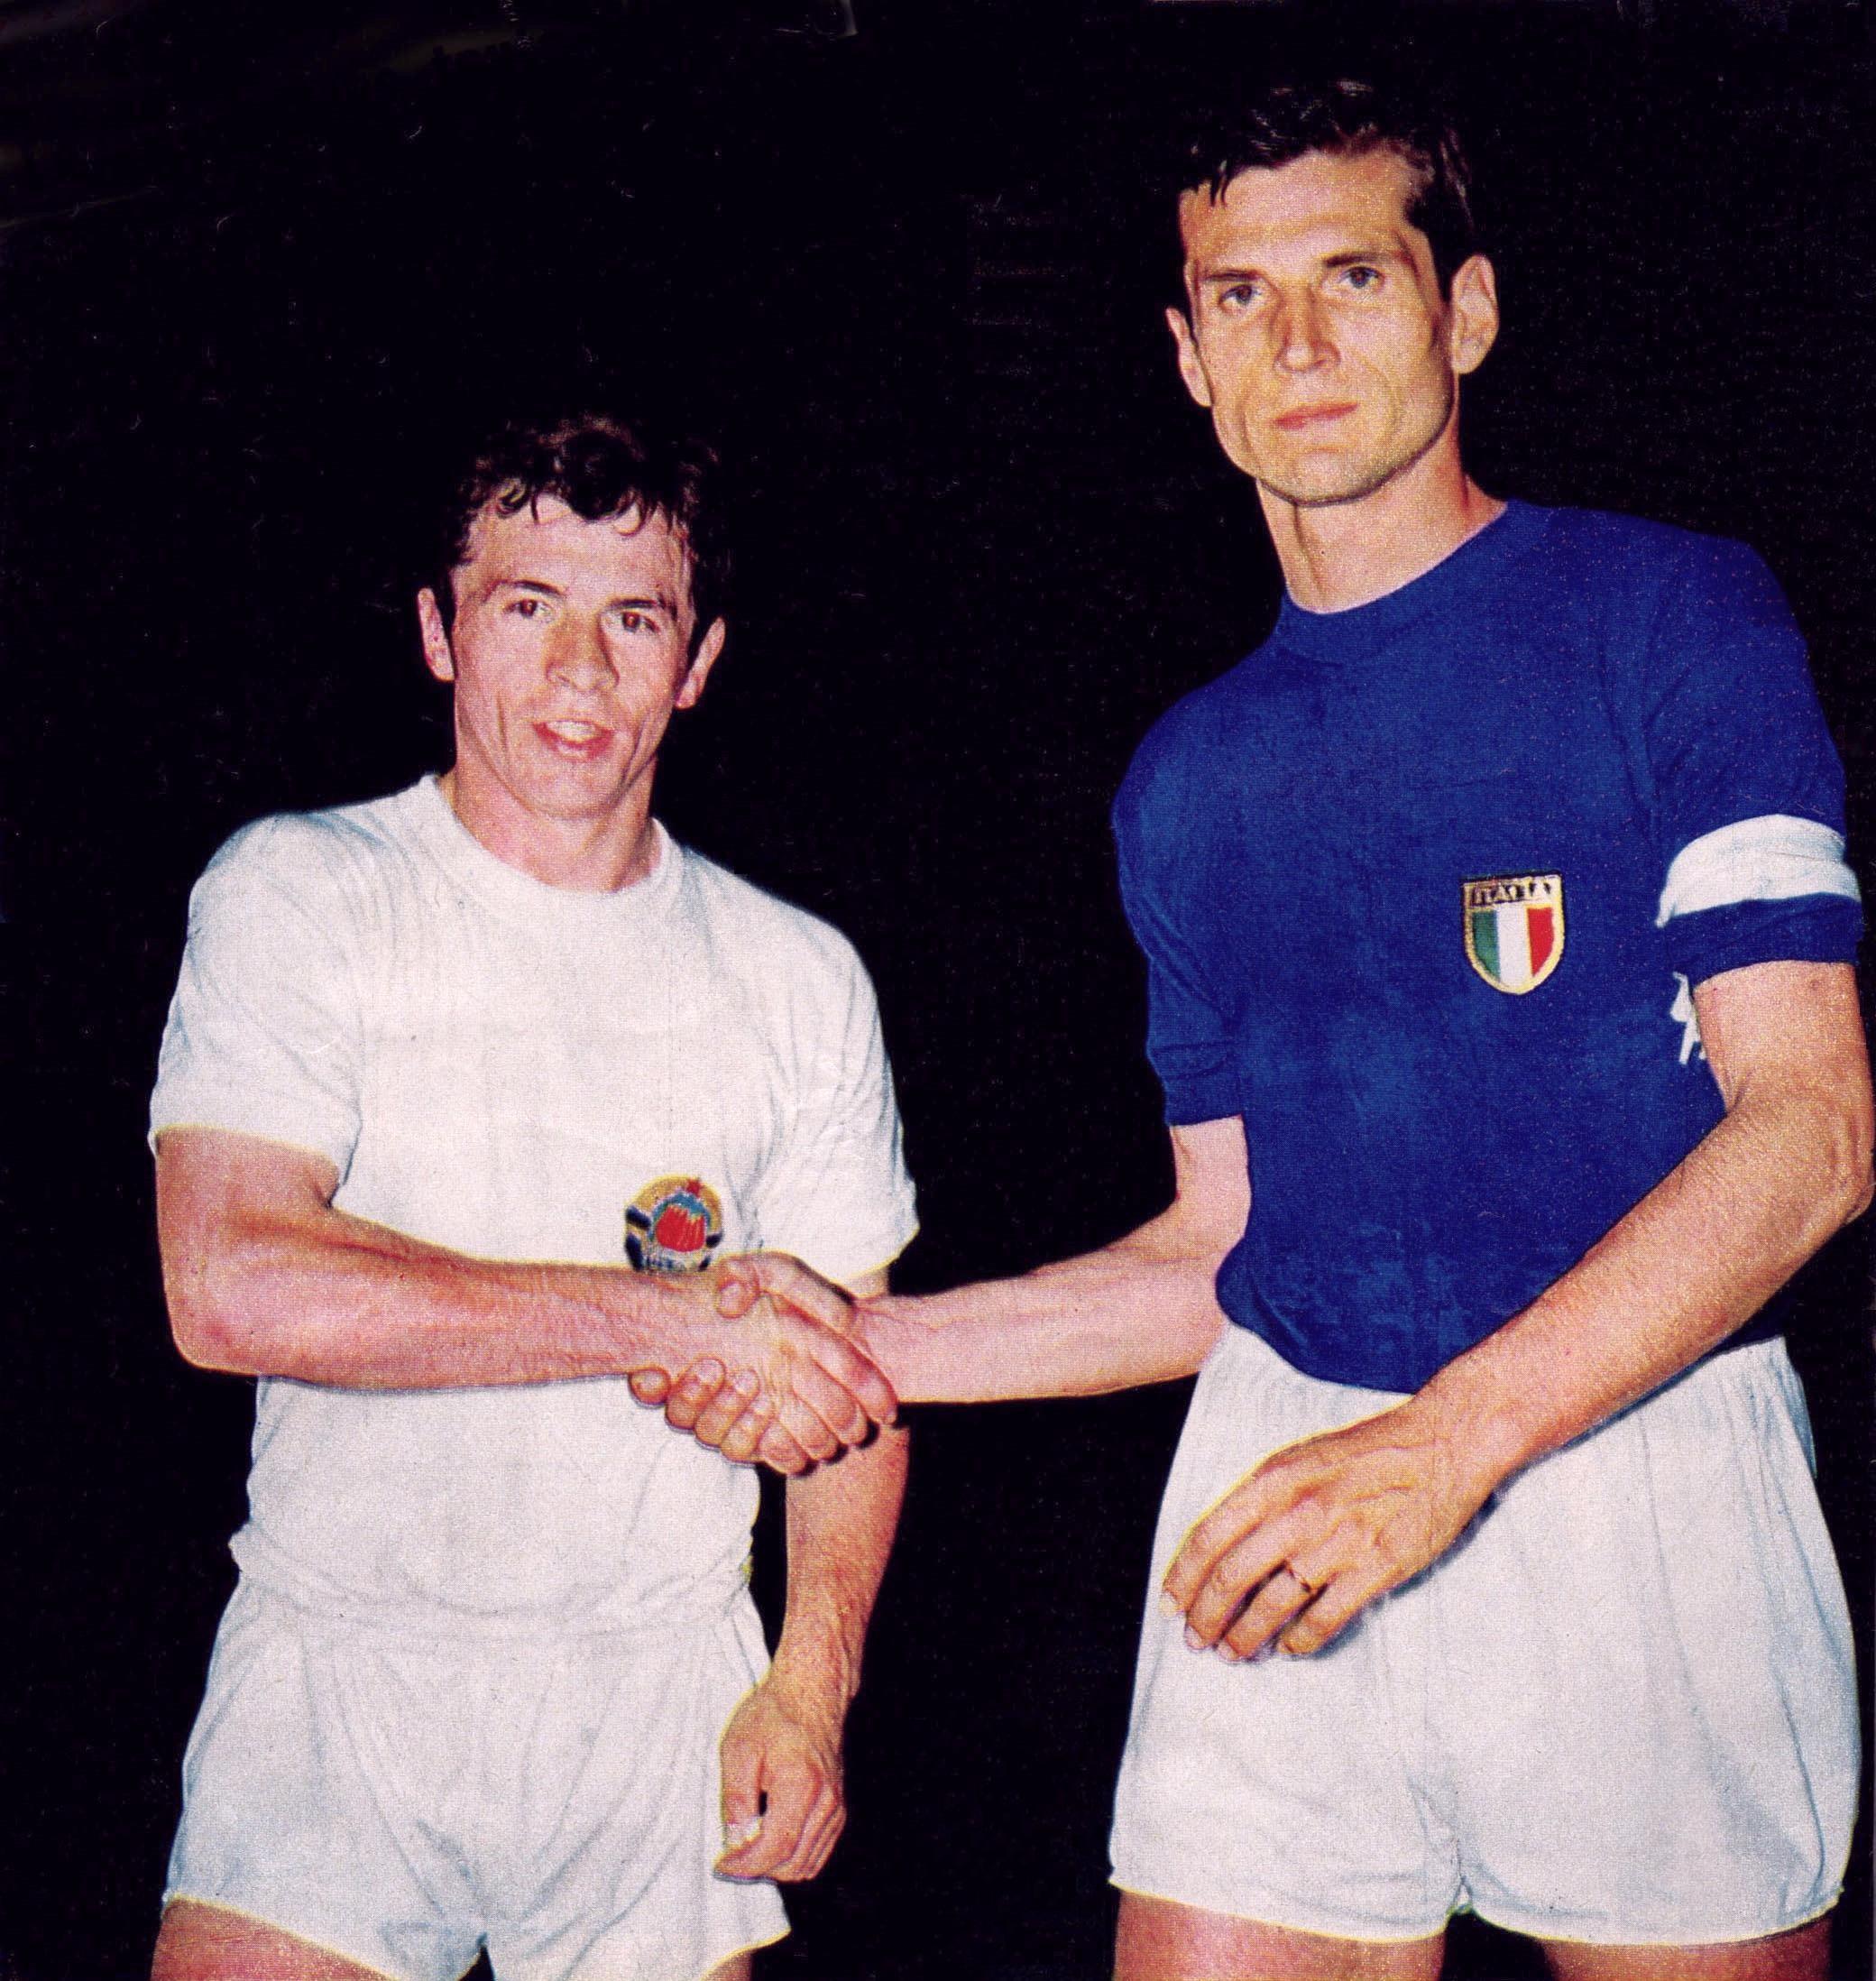 File:UEFA Euro 1968 Final - Italy v Yugoslavia - Ilija Petković and Giacinto Facchetti.jpg - Wikimedia Commons